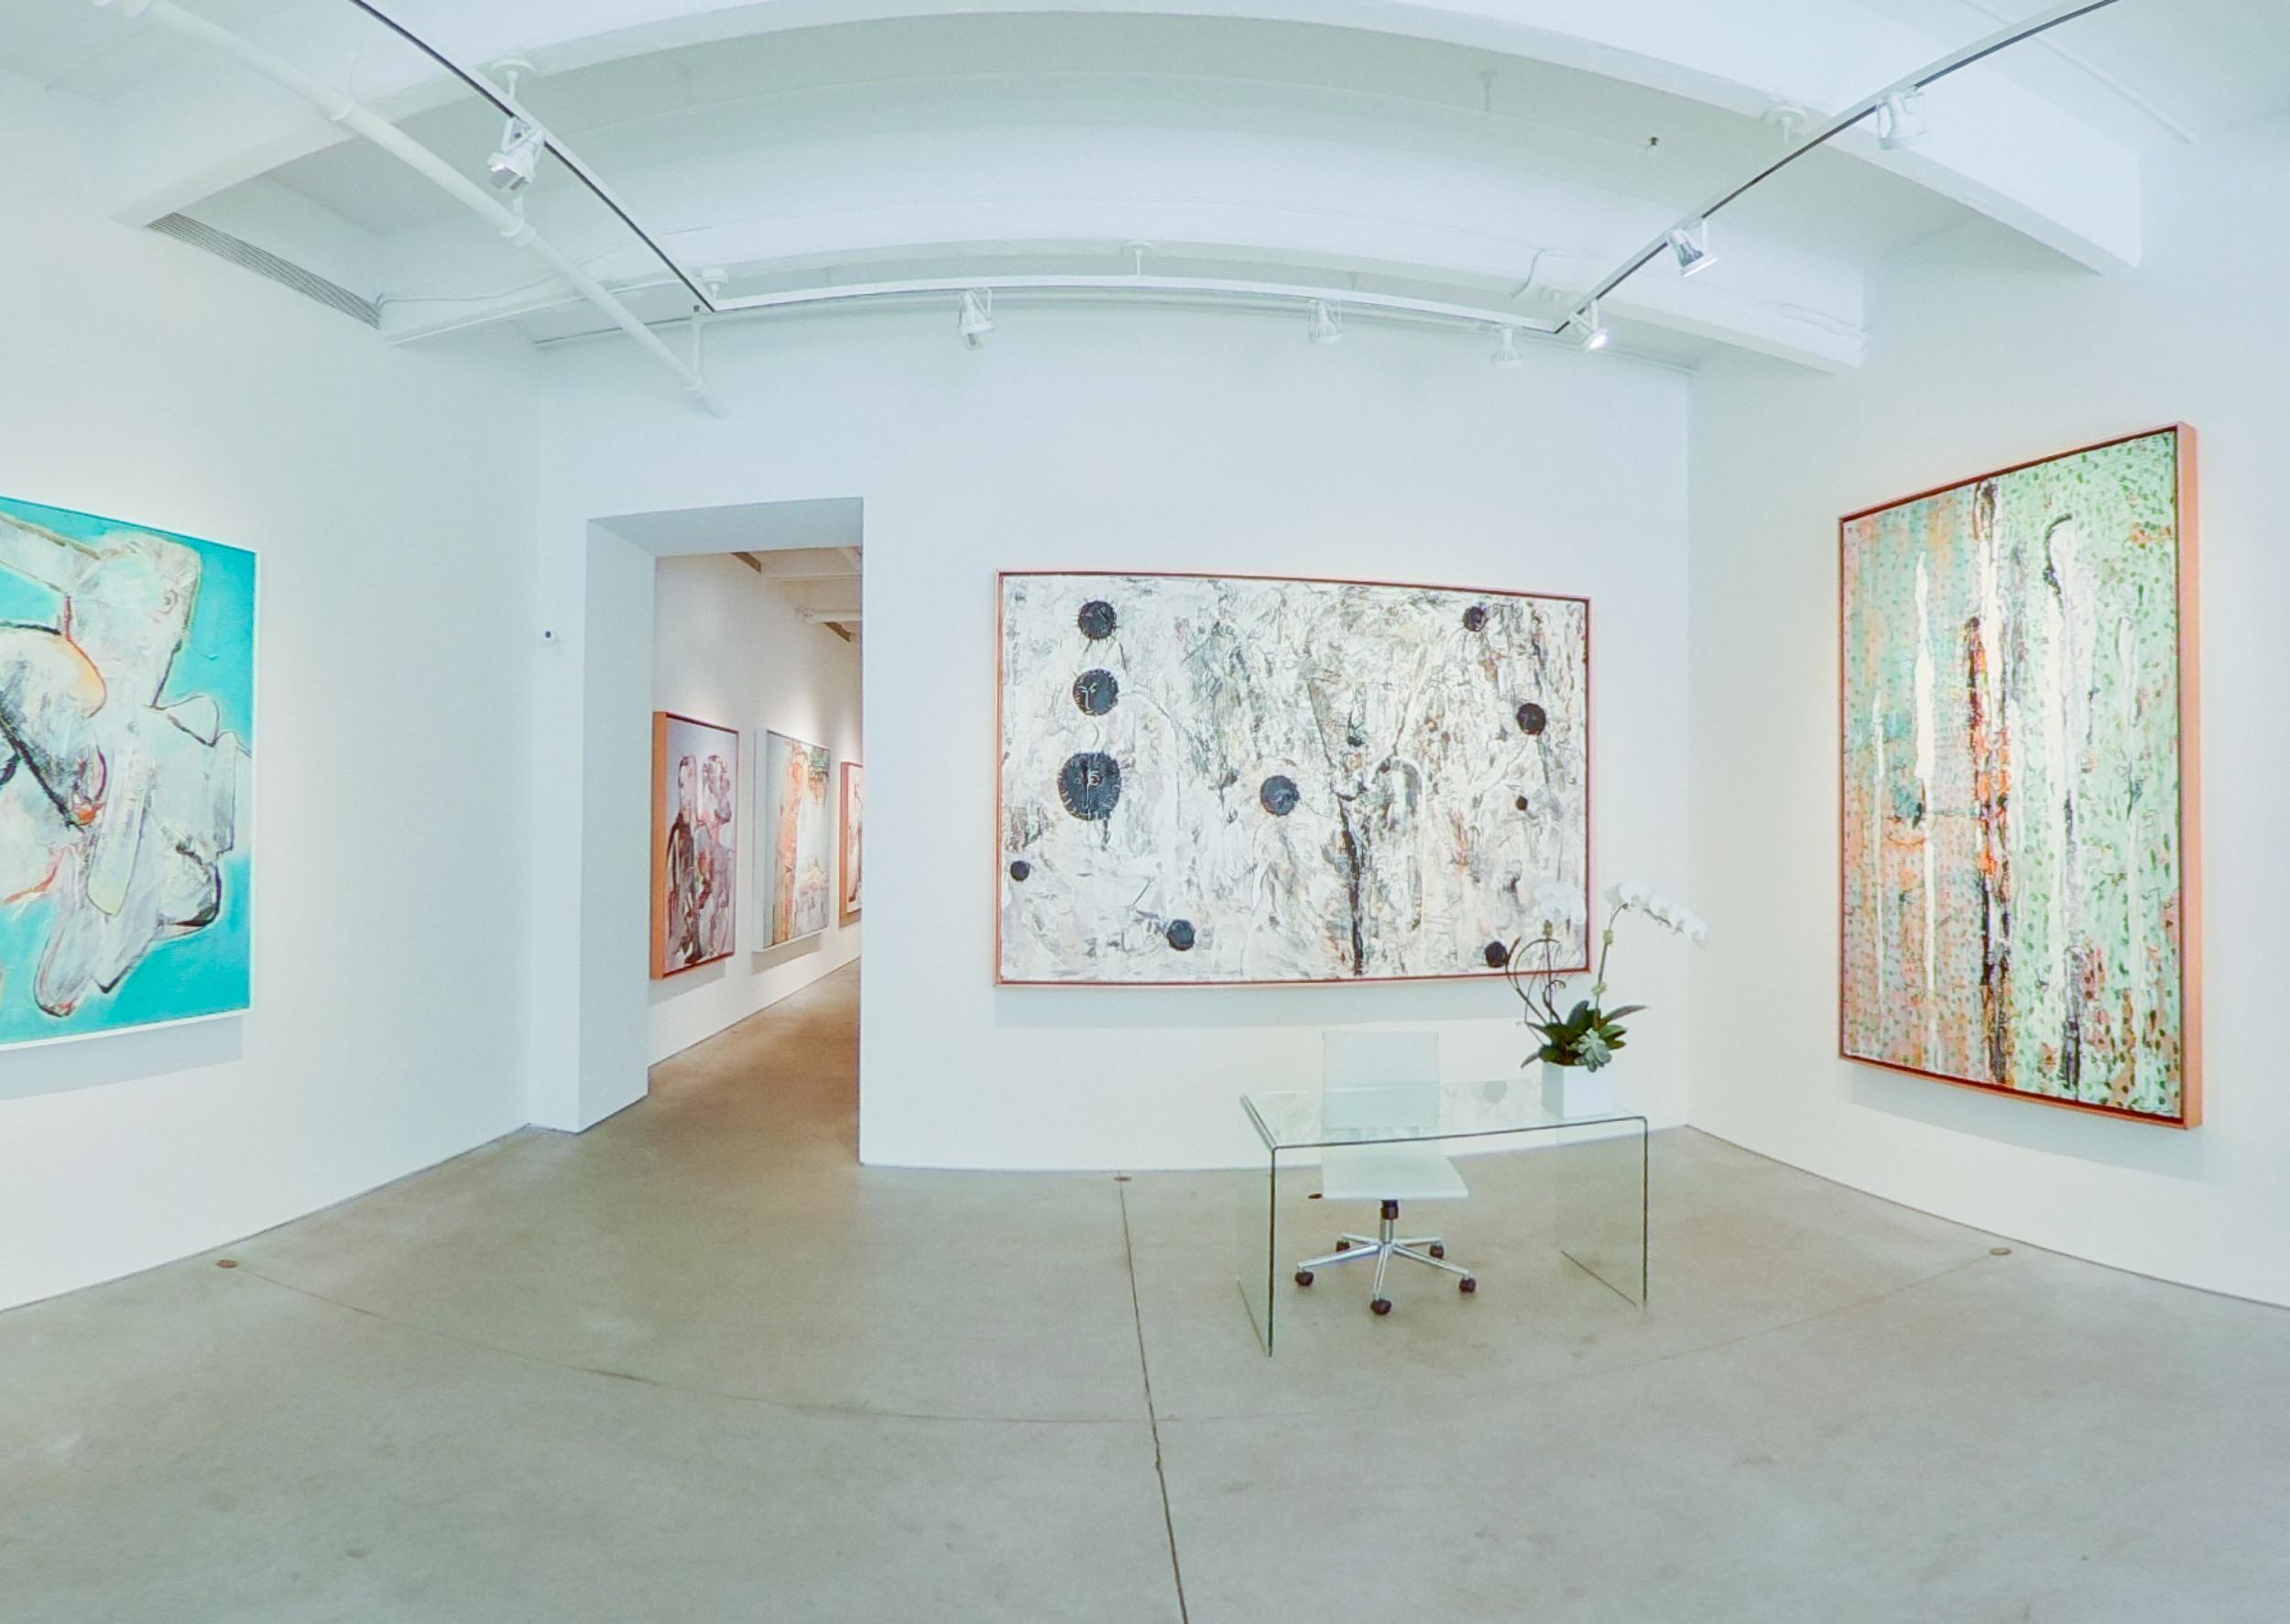 Gallery-Scroll-Liu-Shuishi-02.jpg